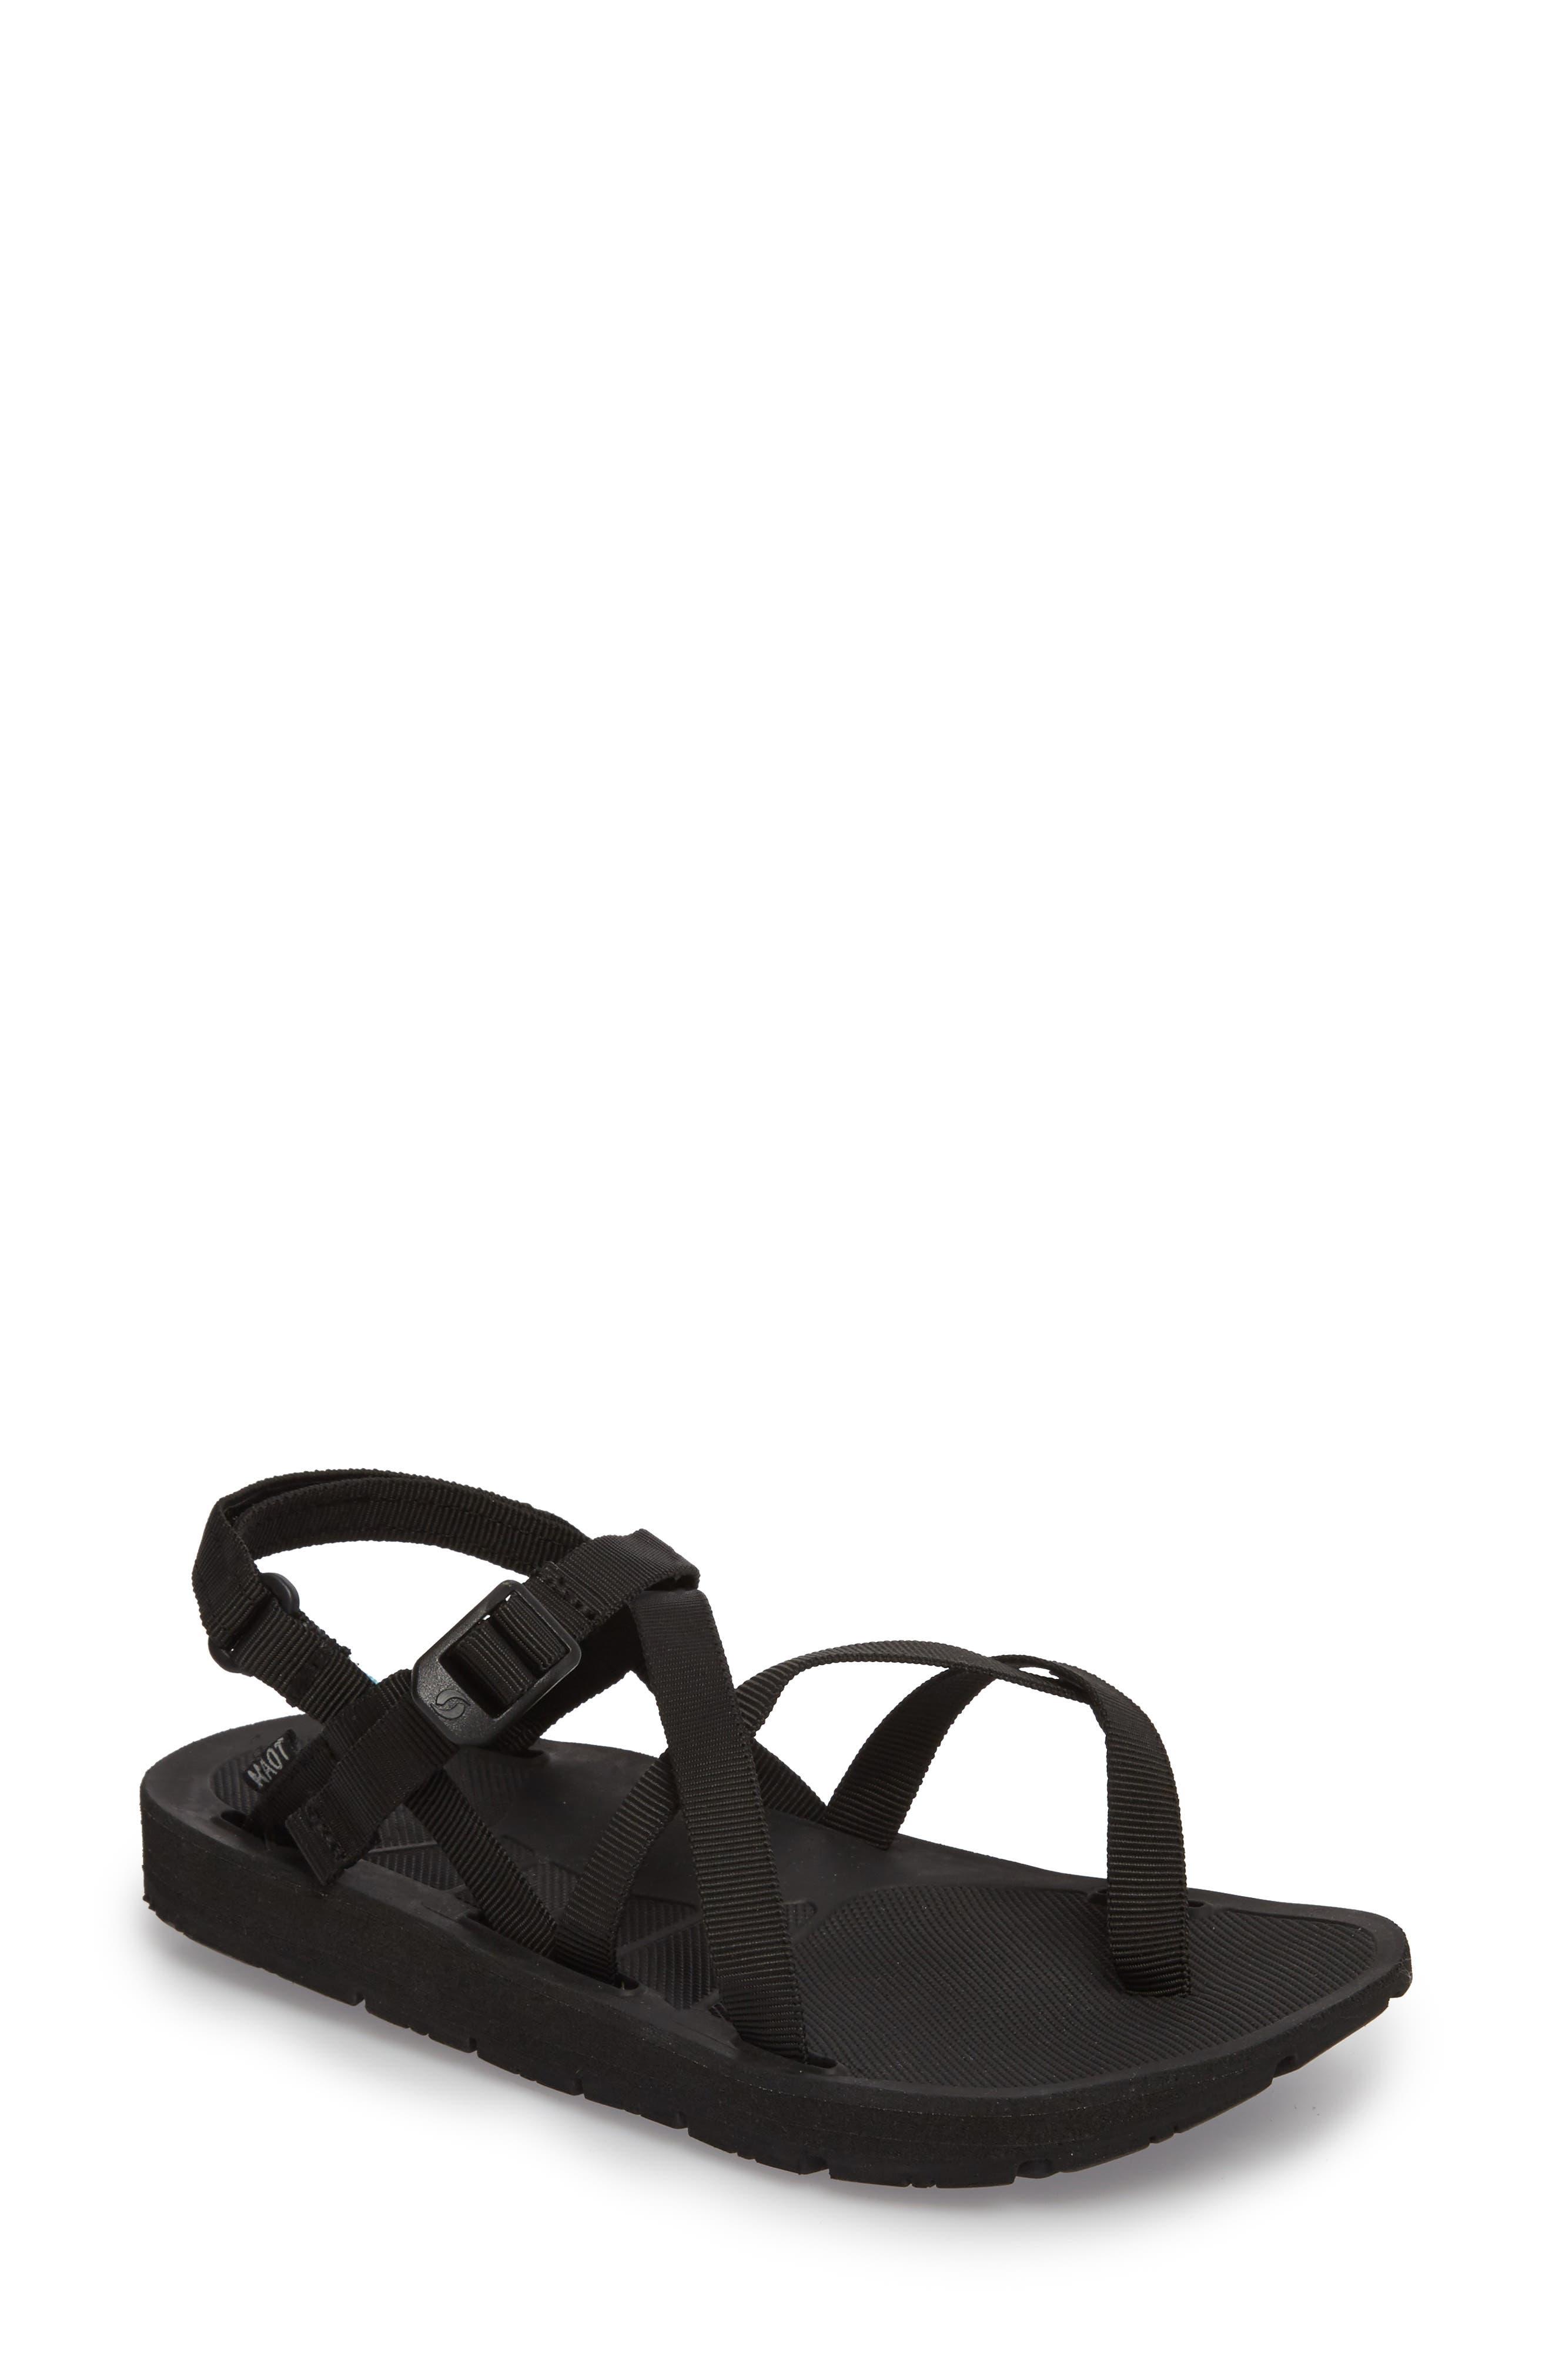 Shore Sandal,                         Main,                         color, BLACK FABRIC